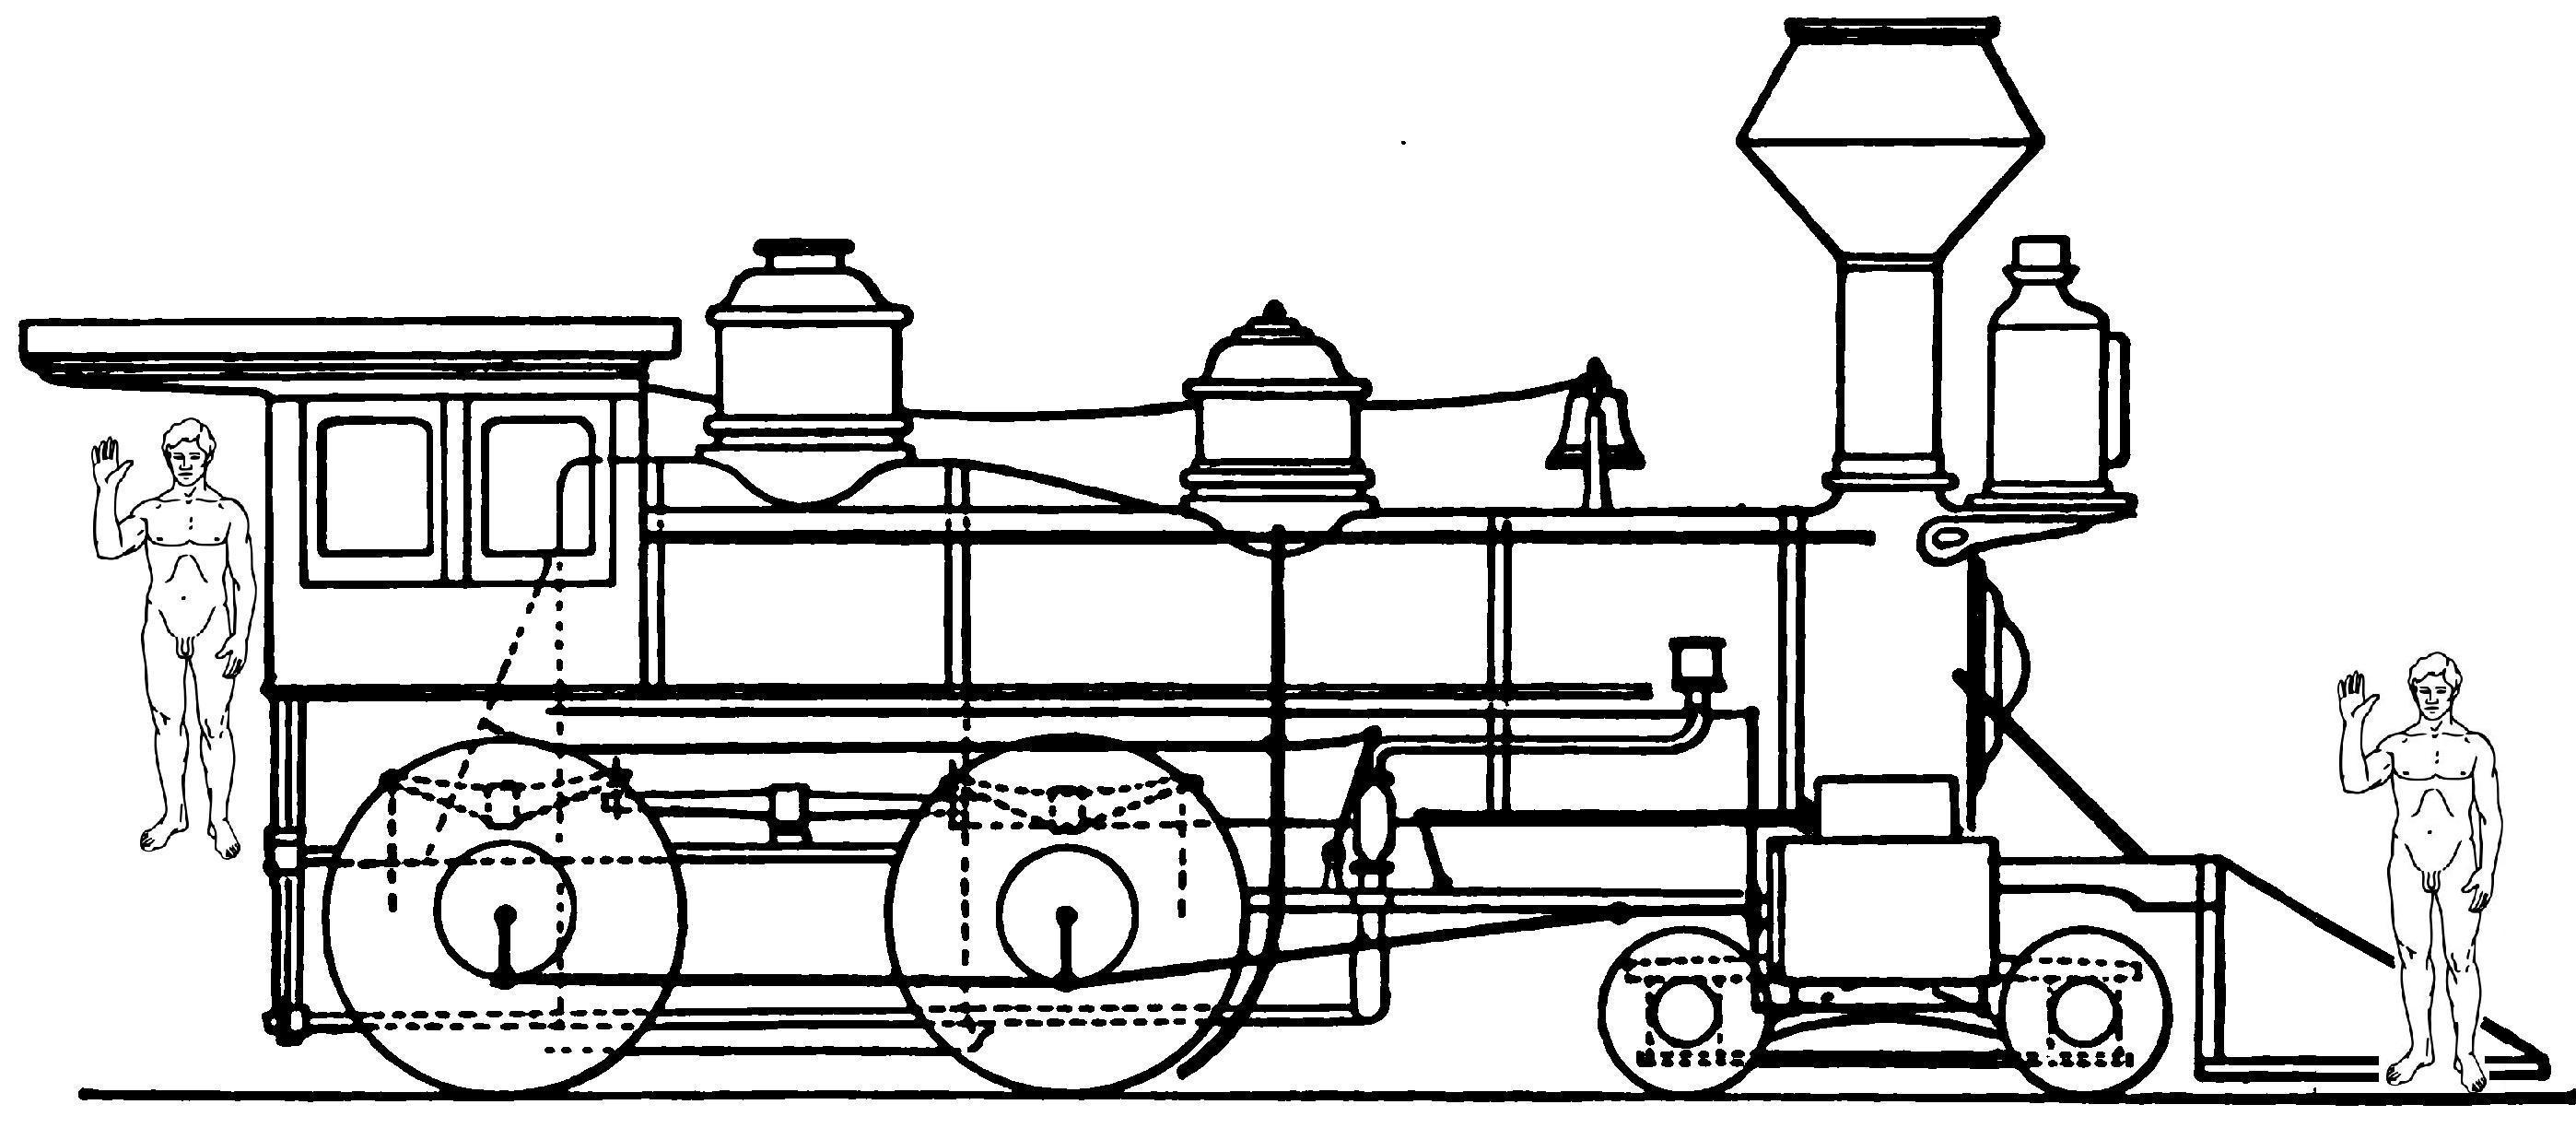 2796x1224 Filetrain Scale 1 1a.jpg